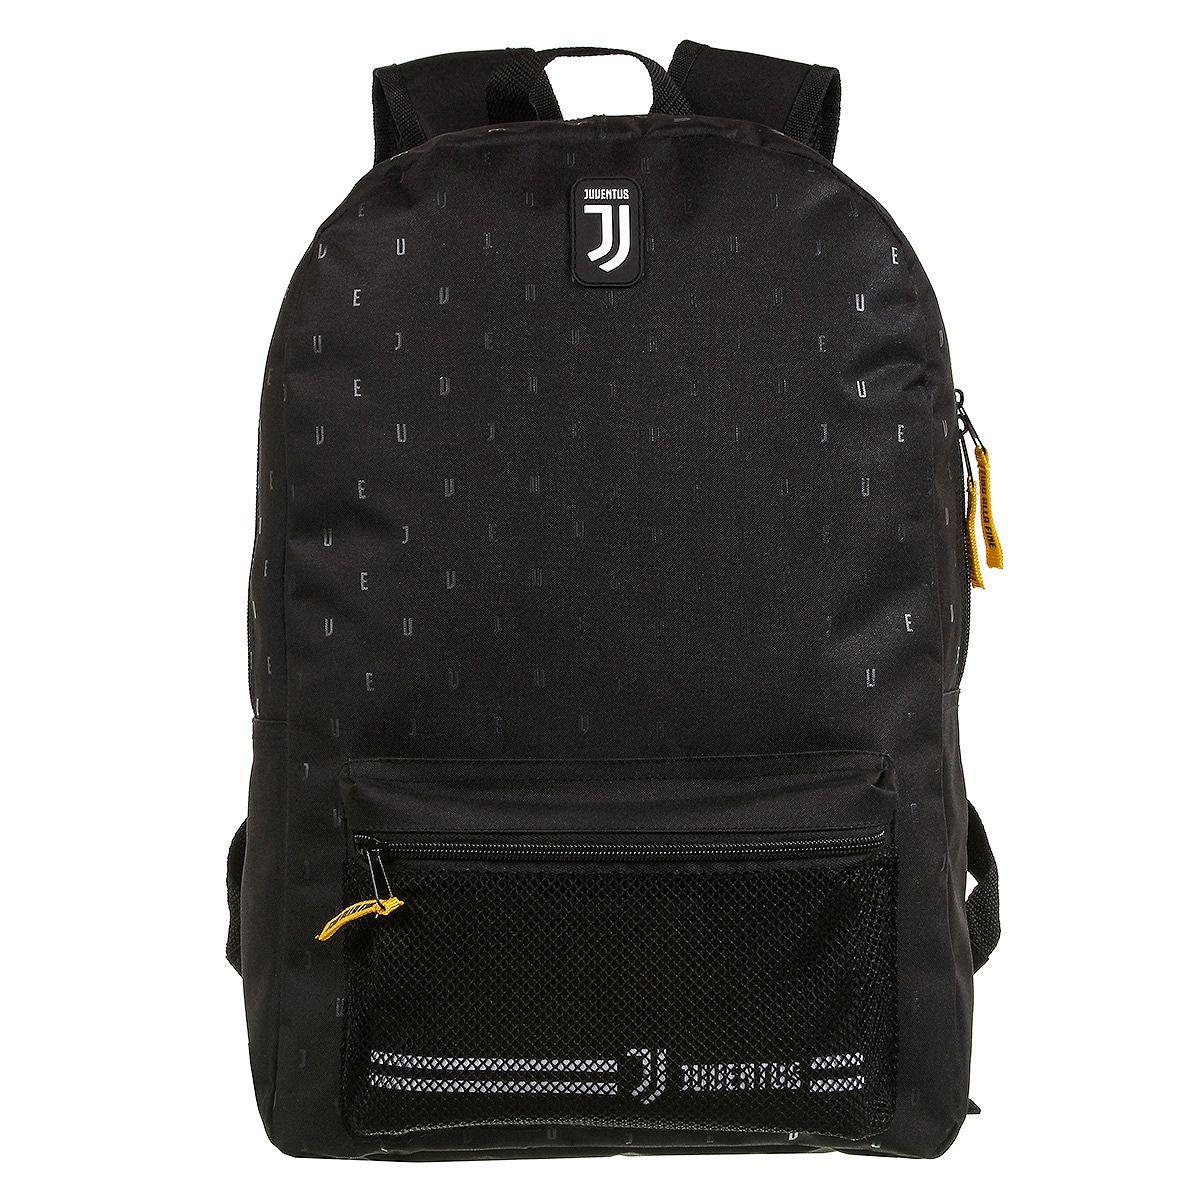 Mochila Juventus Bolso Frontal + Necessarie